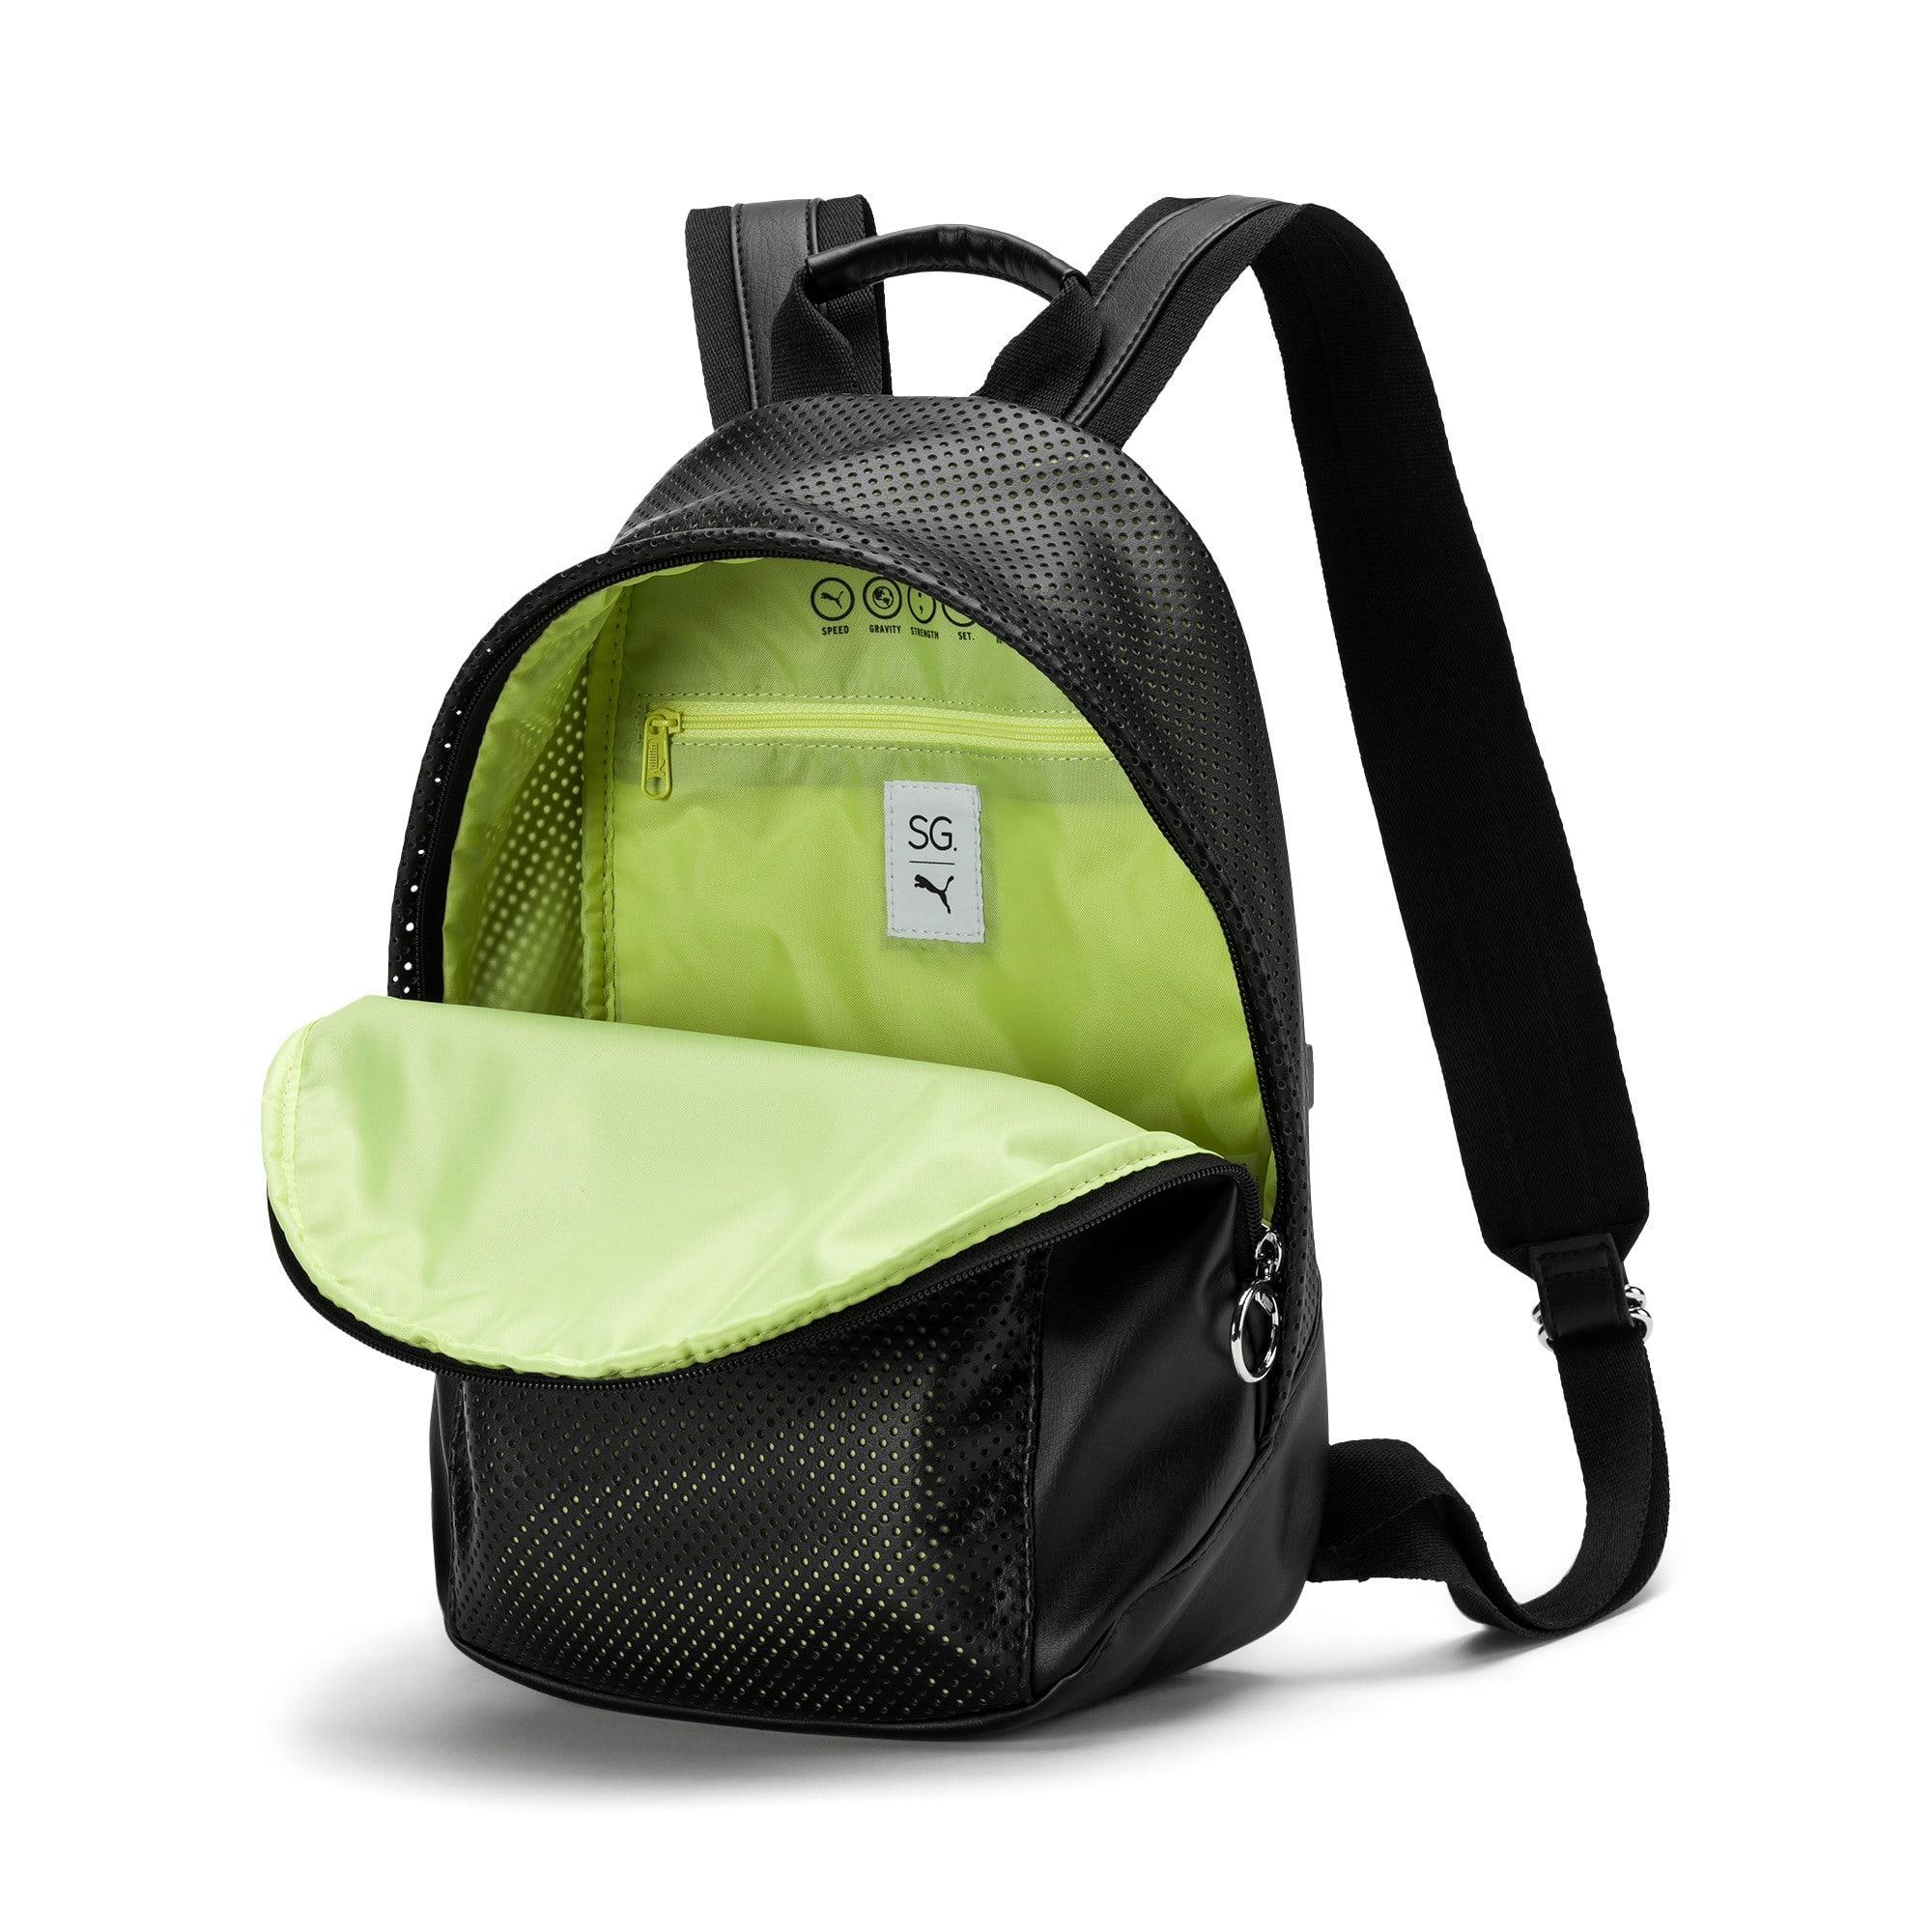 Thumbnail 4 of PUMA x SELENA GOMEZ Style Women's Backpack, Puma Black, medium